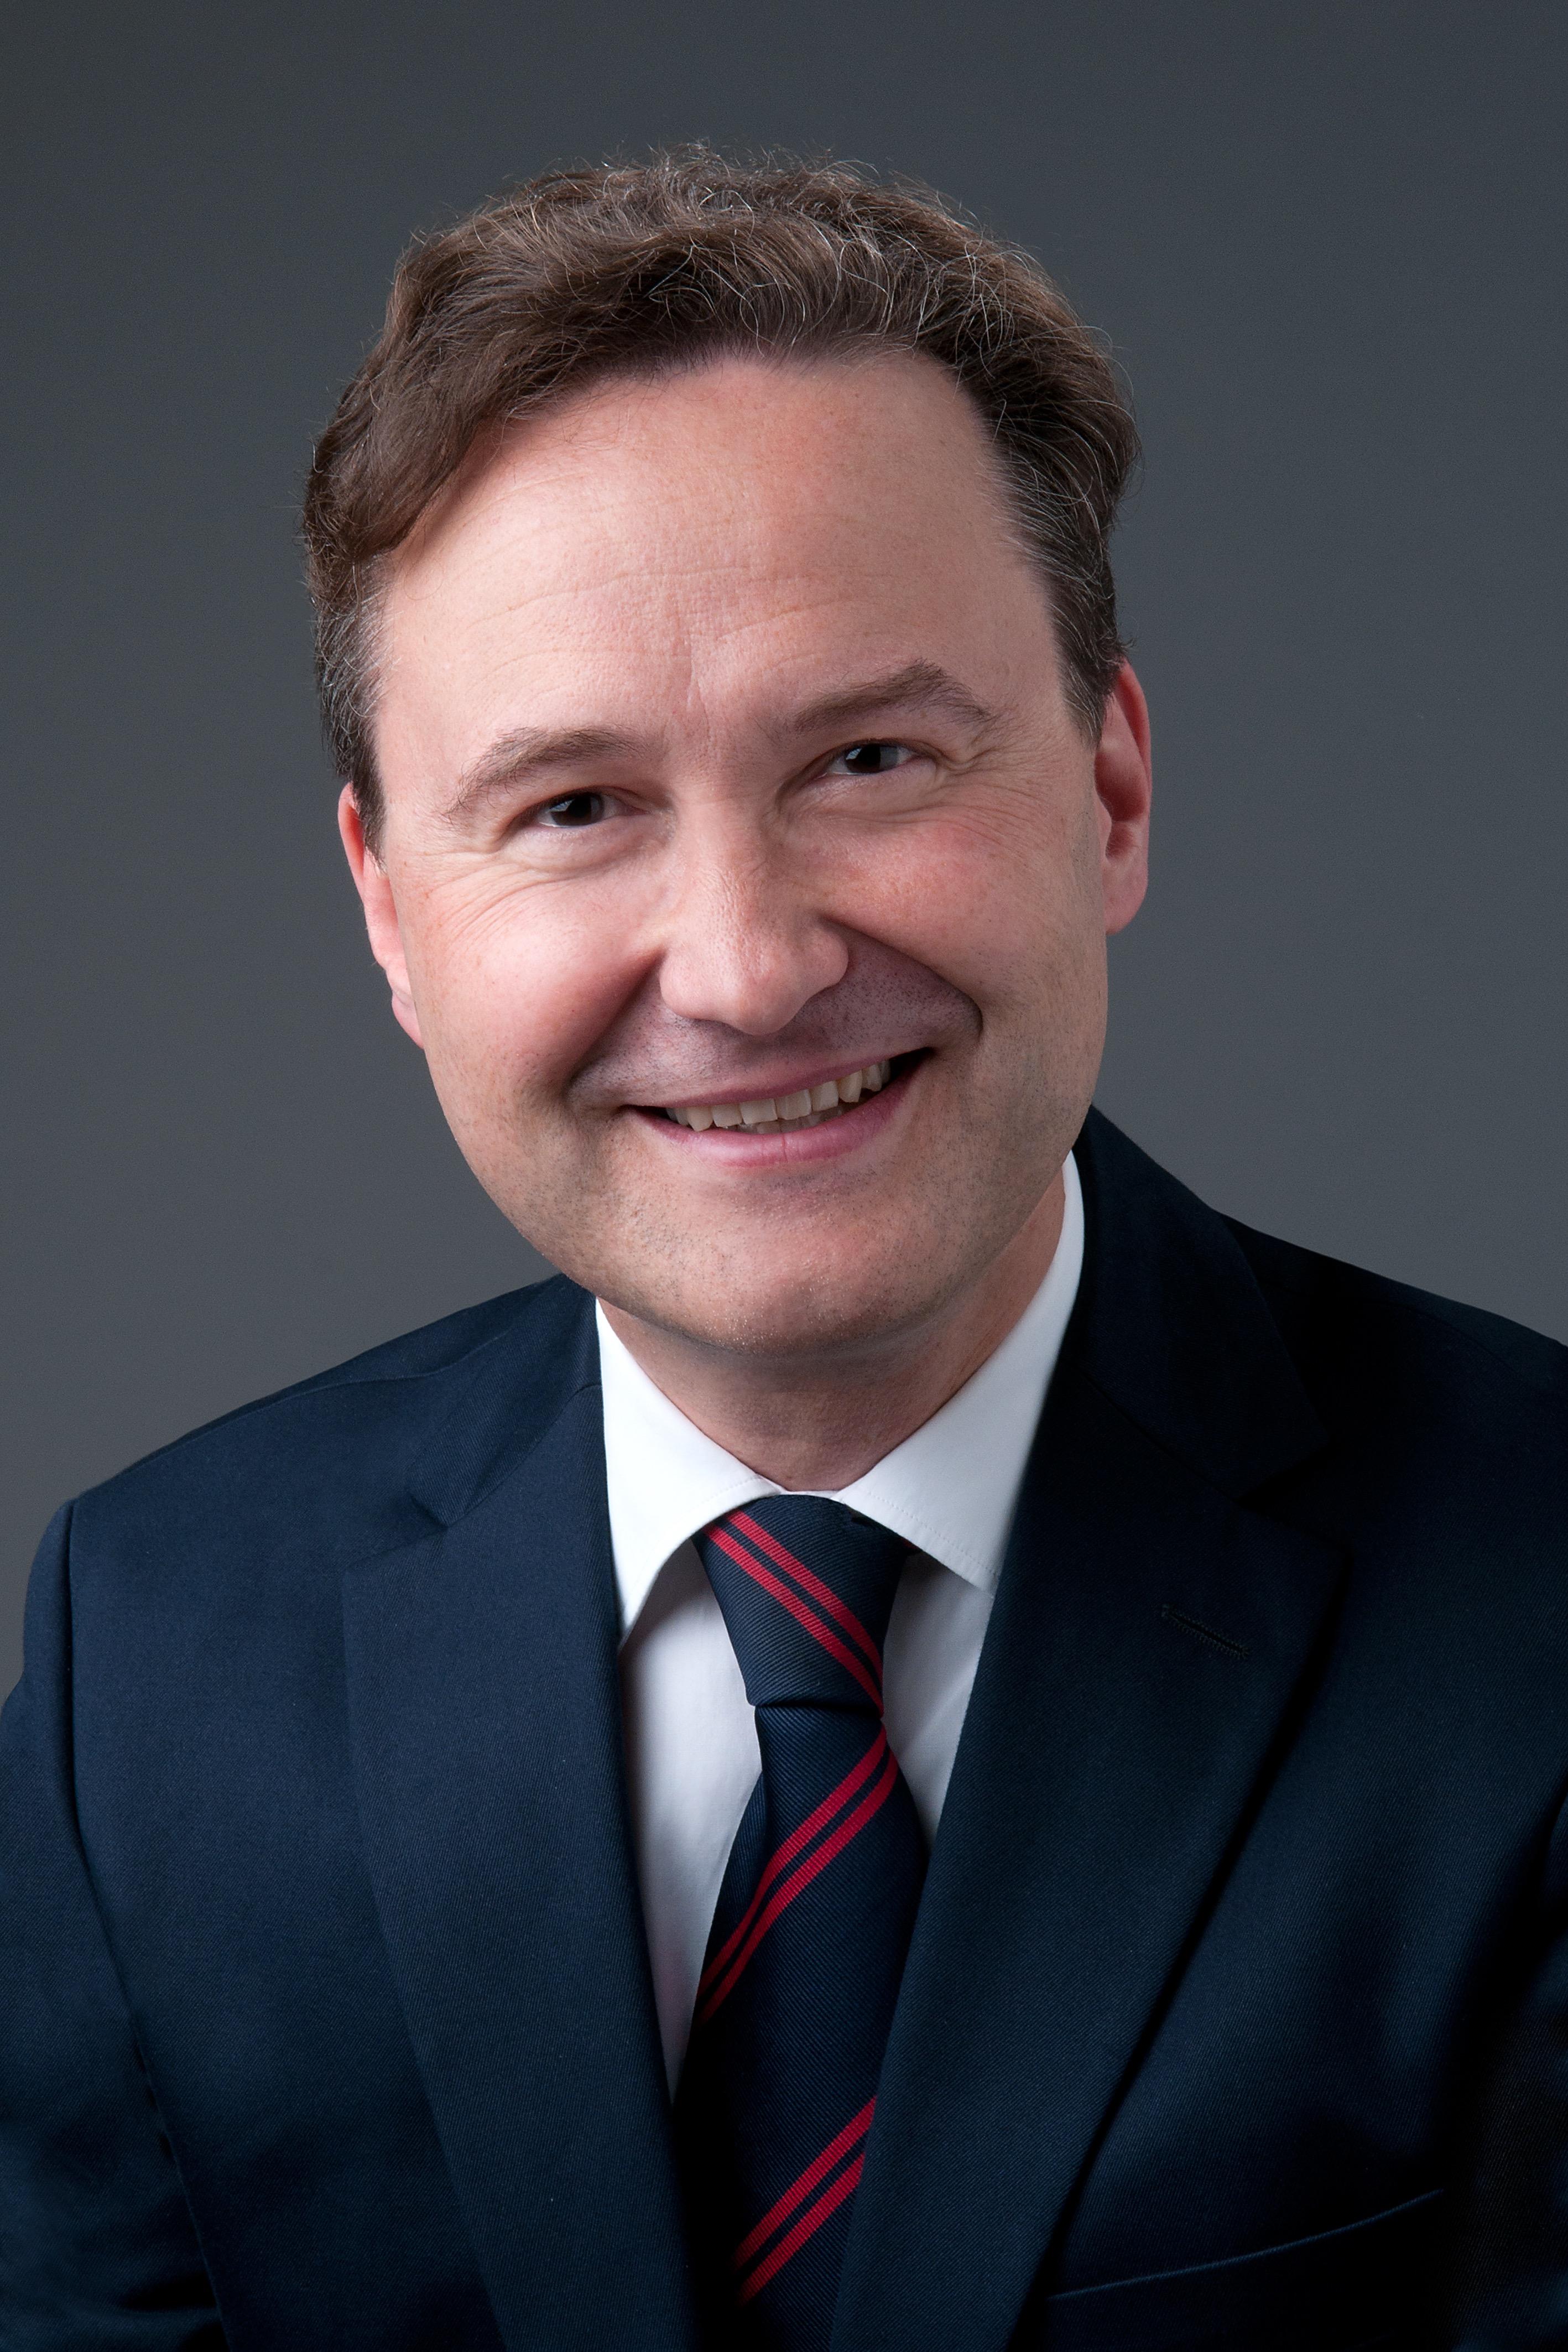 PD Dr. Carl Alexander Krethlow